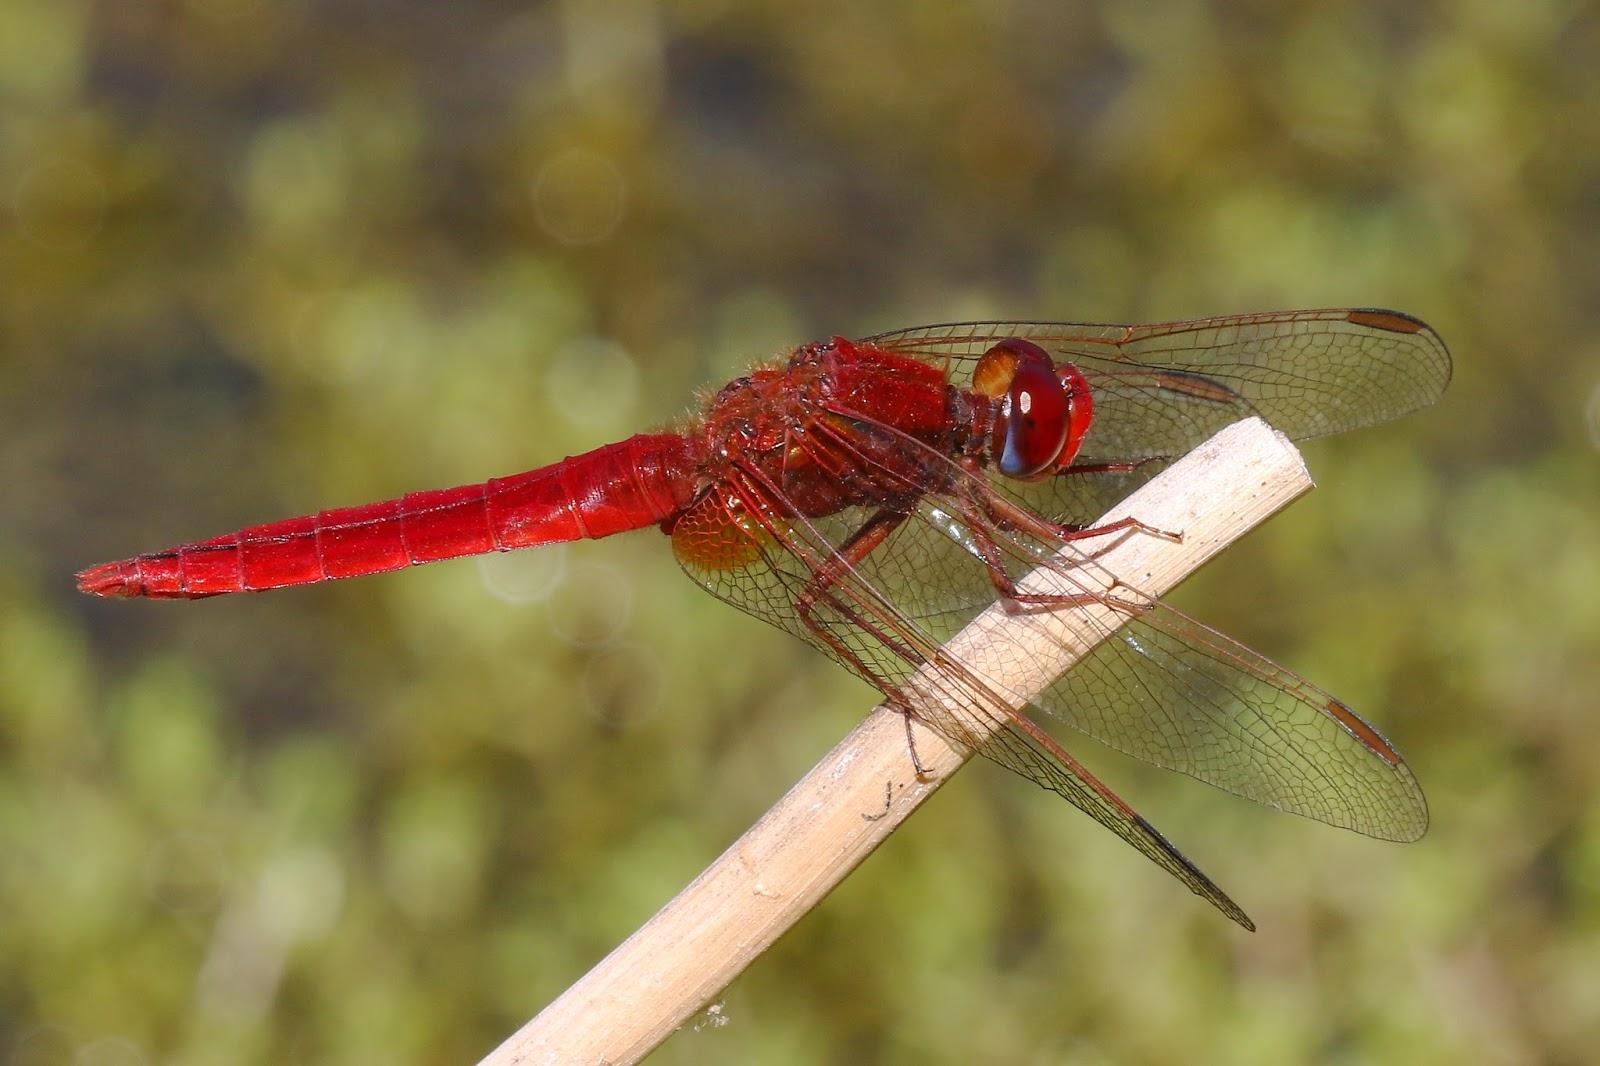 Peter Moore's Wildlife Blog: Scarlet fever at Longham Lakes Scarlet Fever